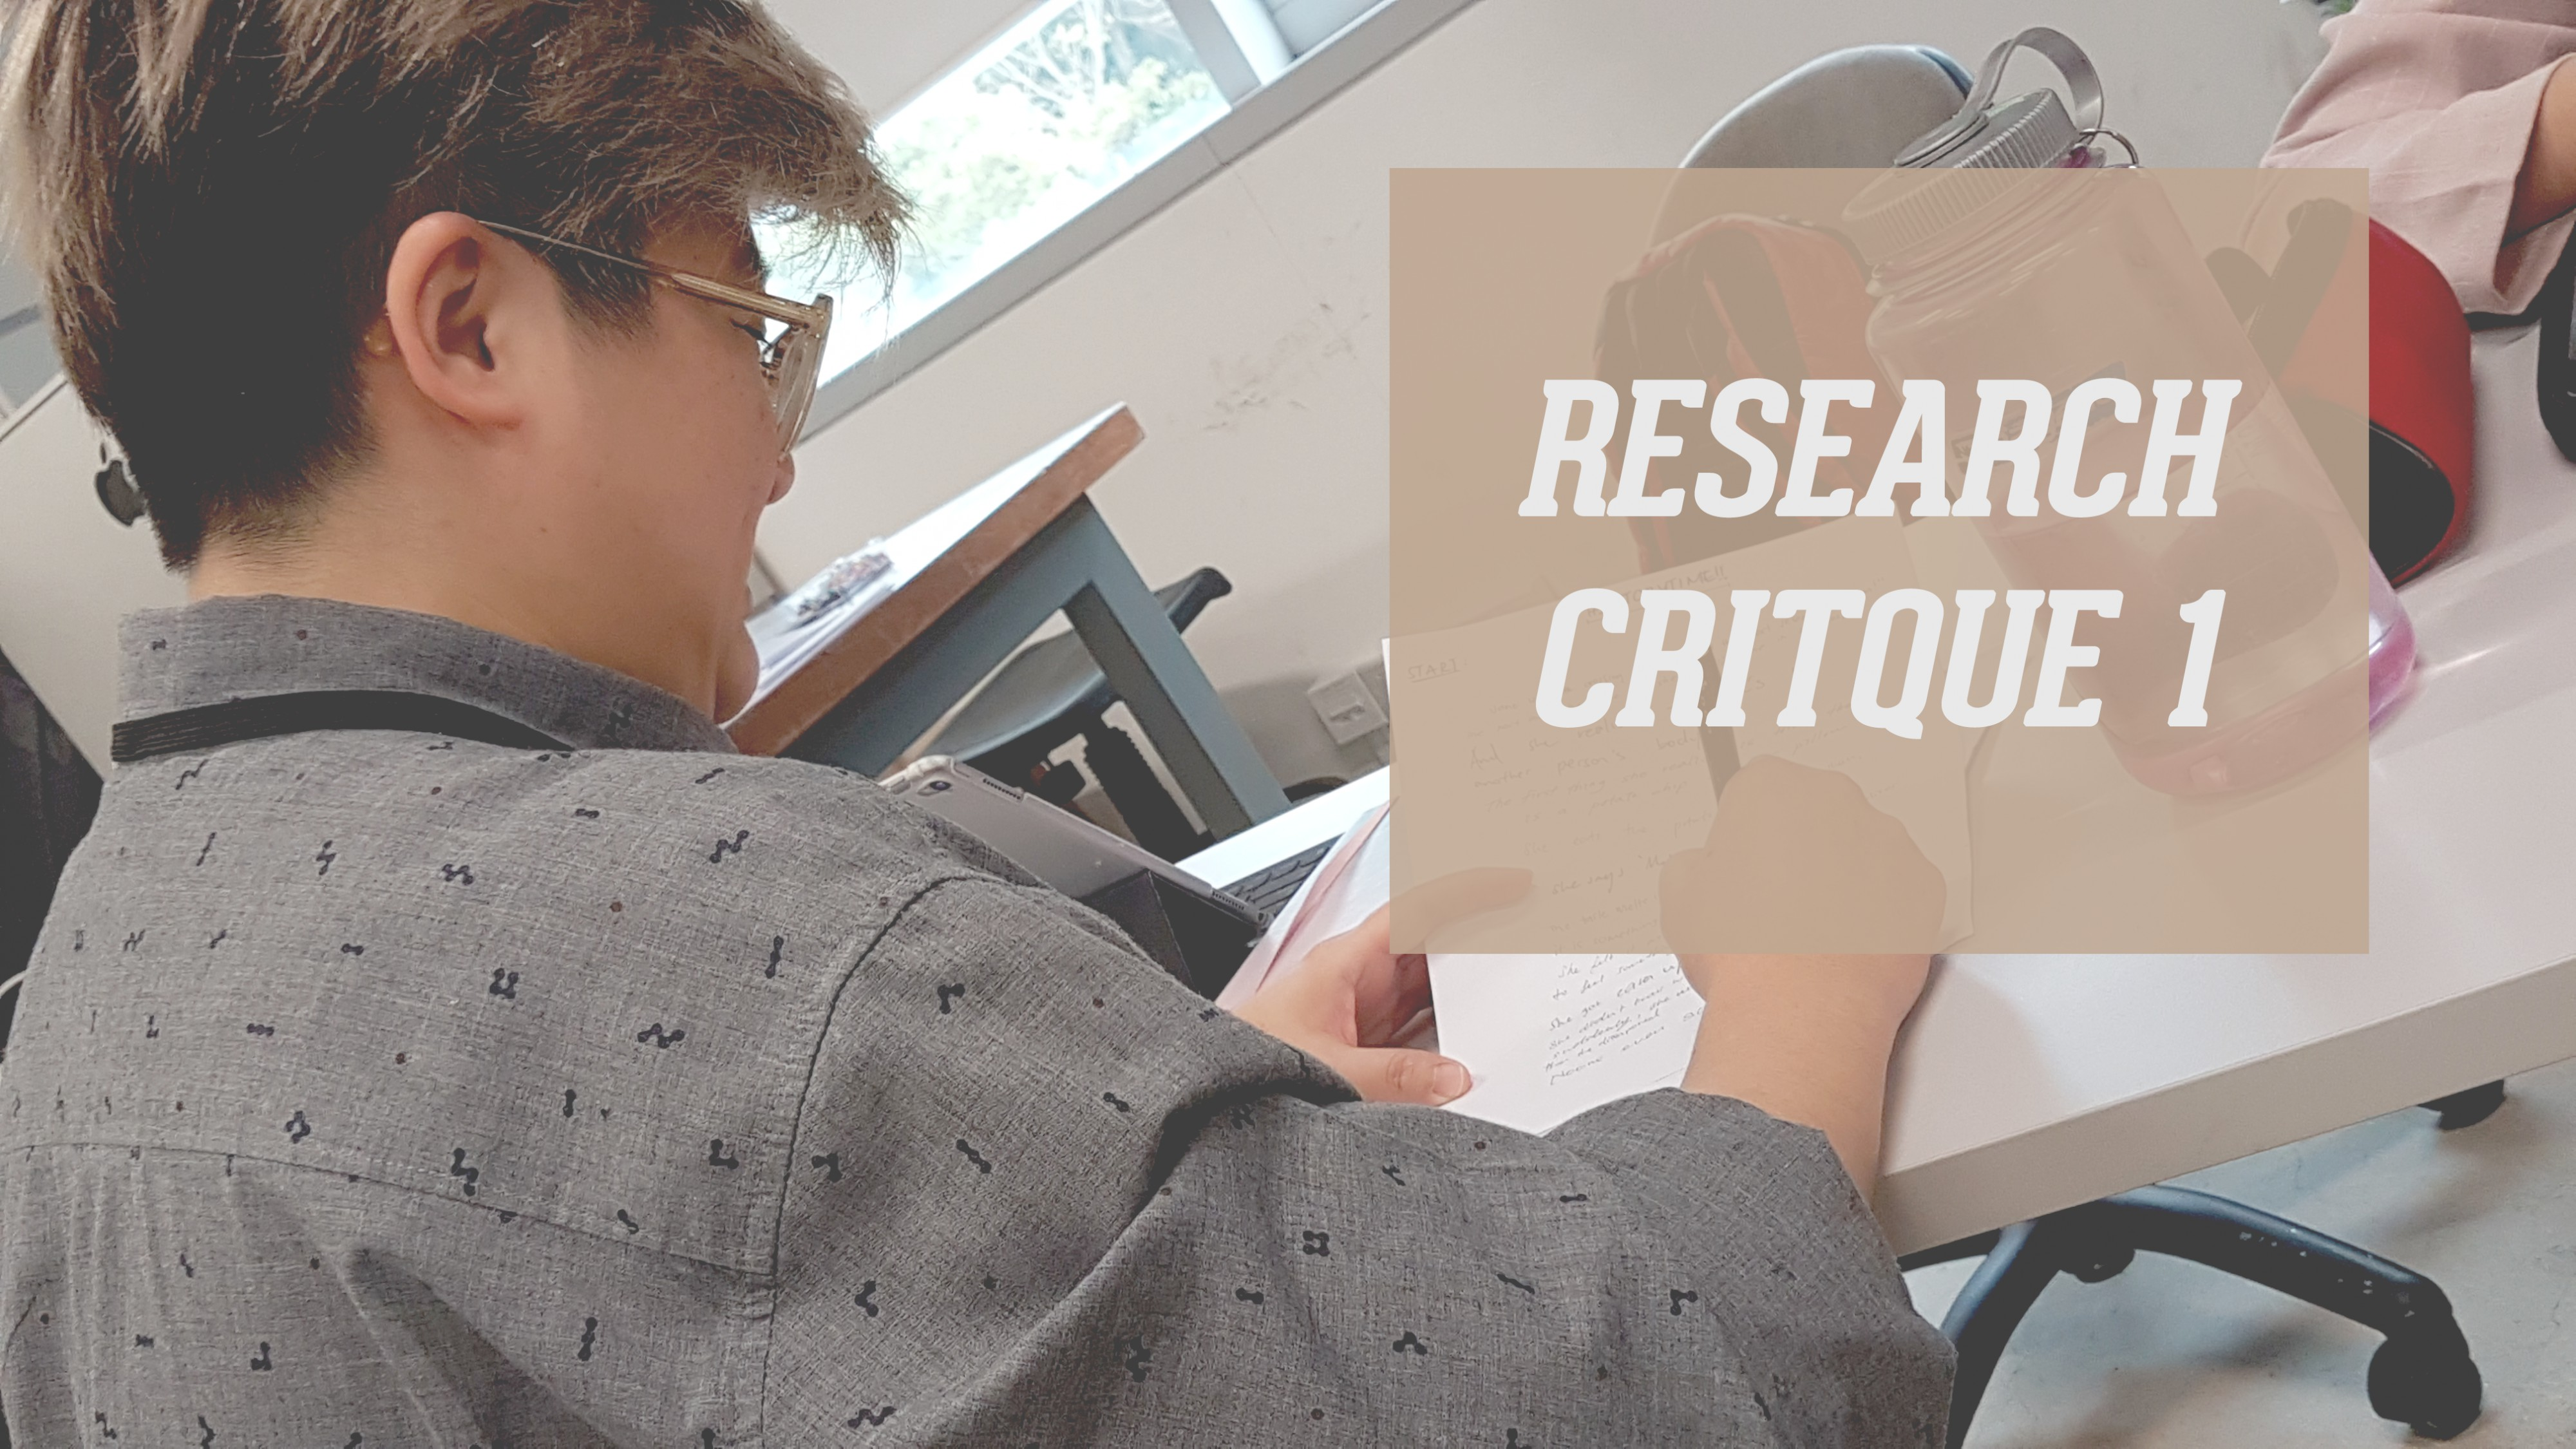 RESEARCH CRITIQUE 1: CROWD-SOURCED ARTWORK